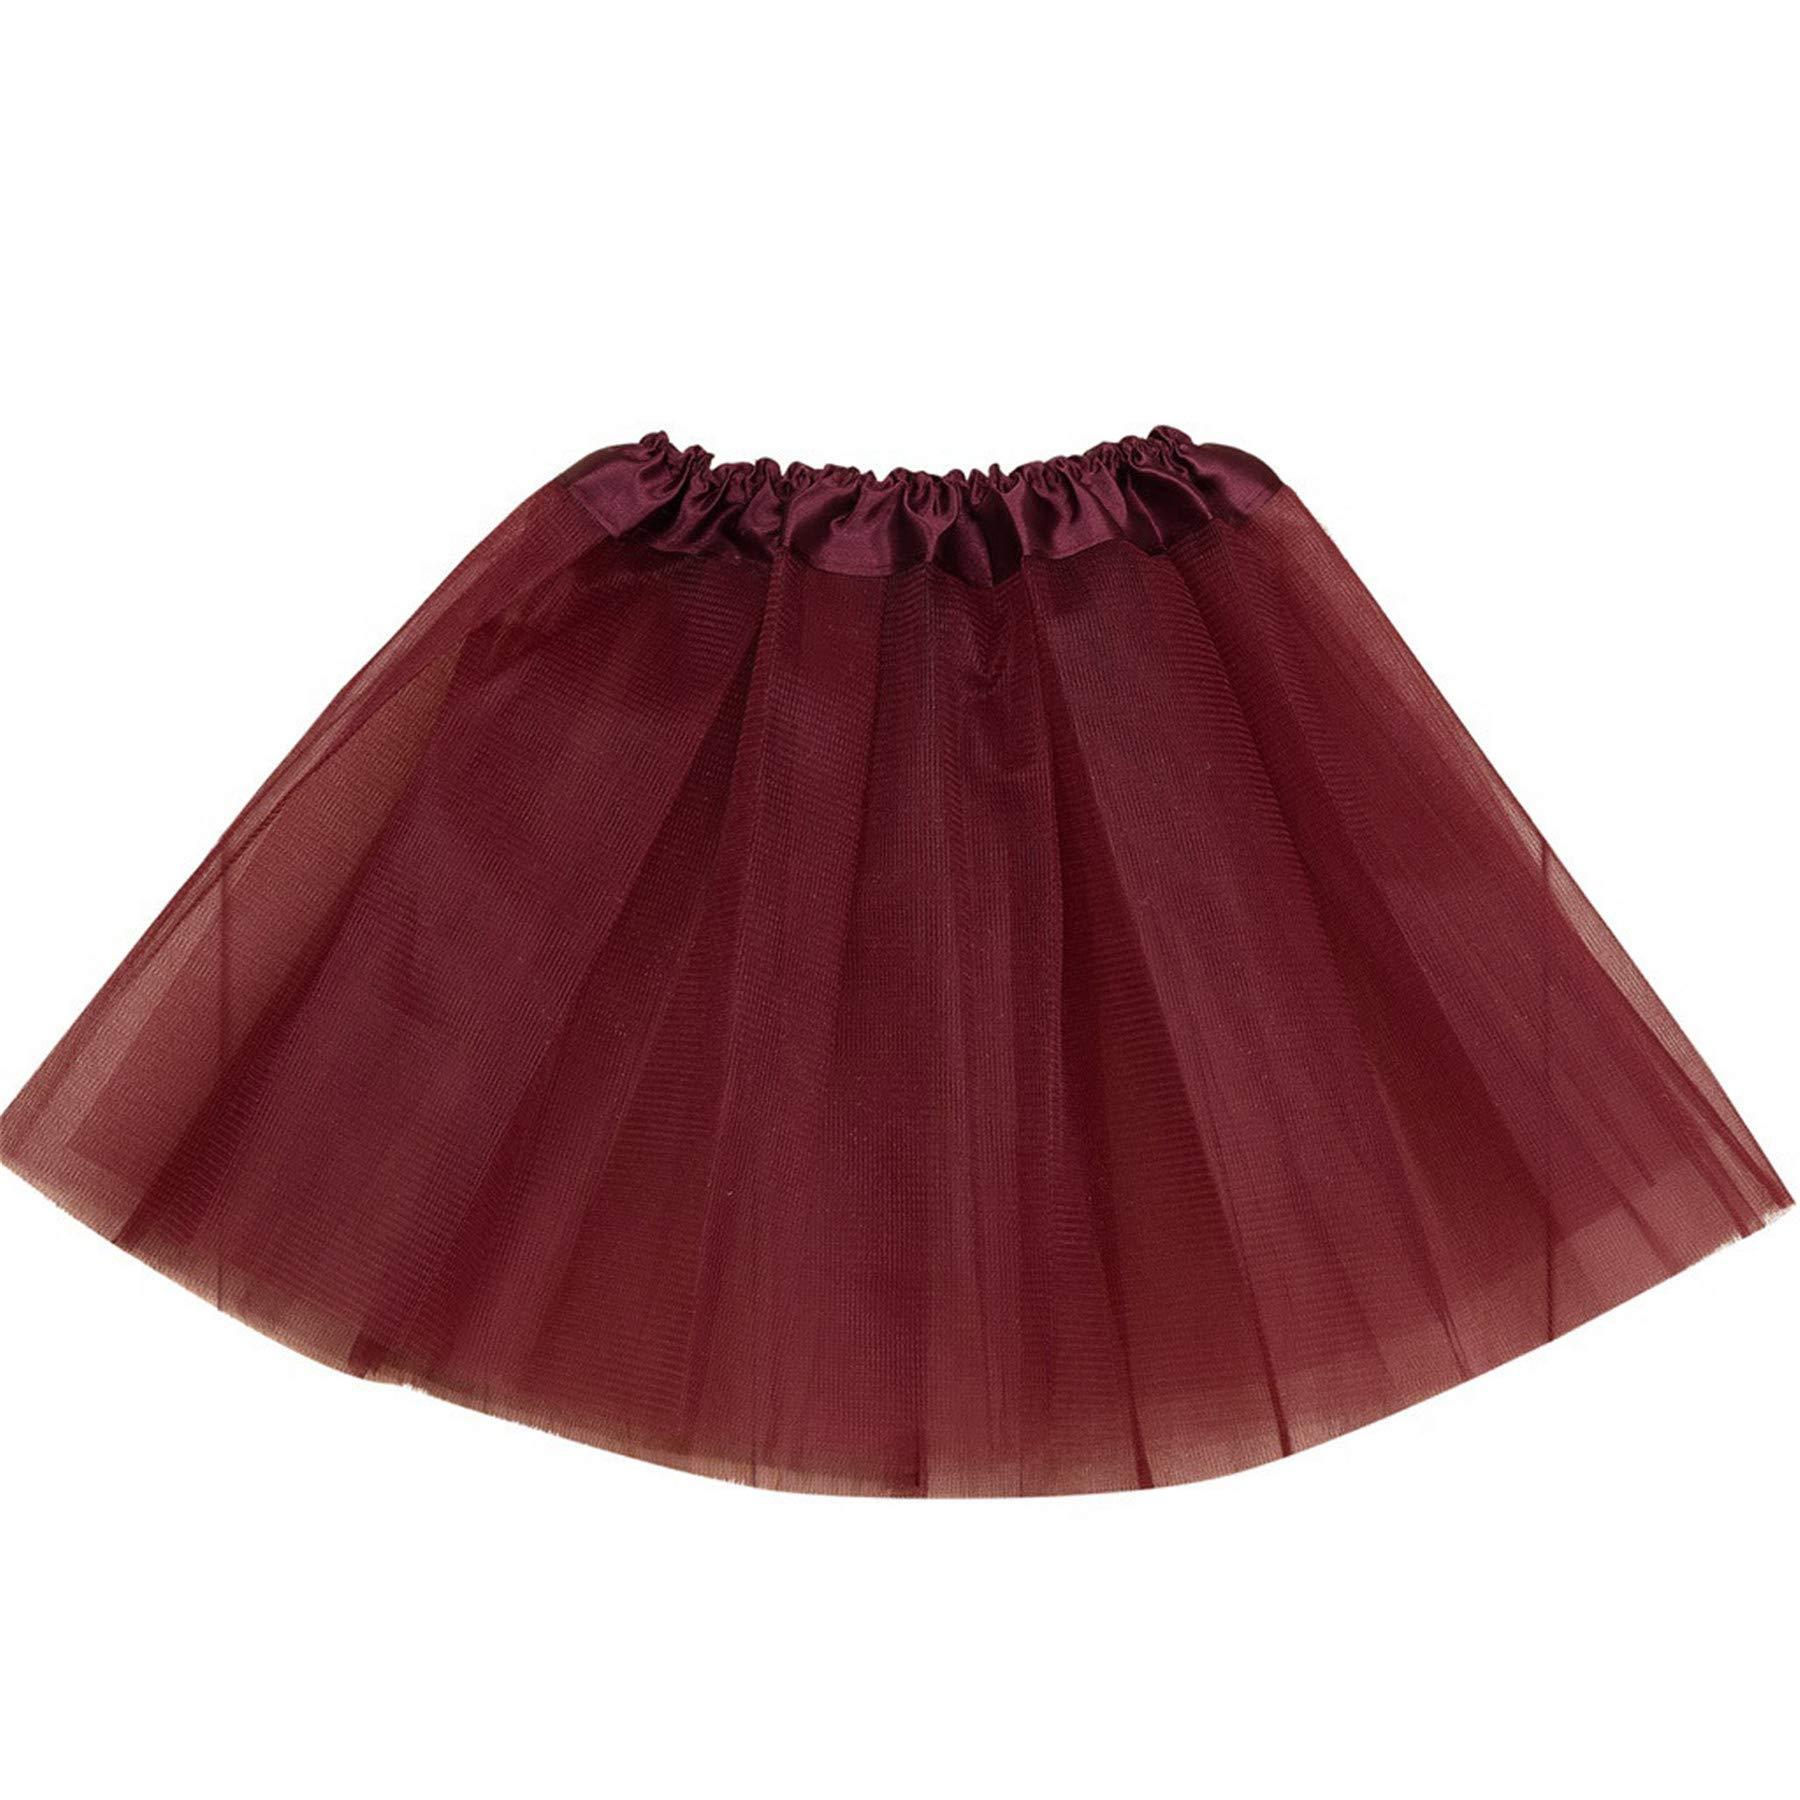 Summer Baby Girls Ballet Dance Skirt Tutu Tulle Princess Skirt Solid Elastic Waistband Party Pageant Pettiskirt Costume (Wine, 2-8 T) by pengchengxinmiao-Girls Skirt (Image #1)